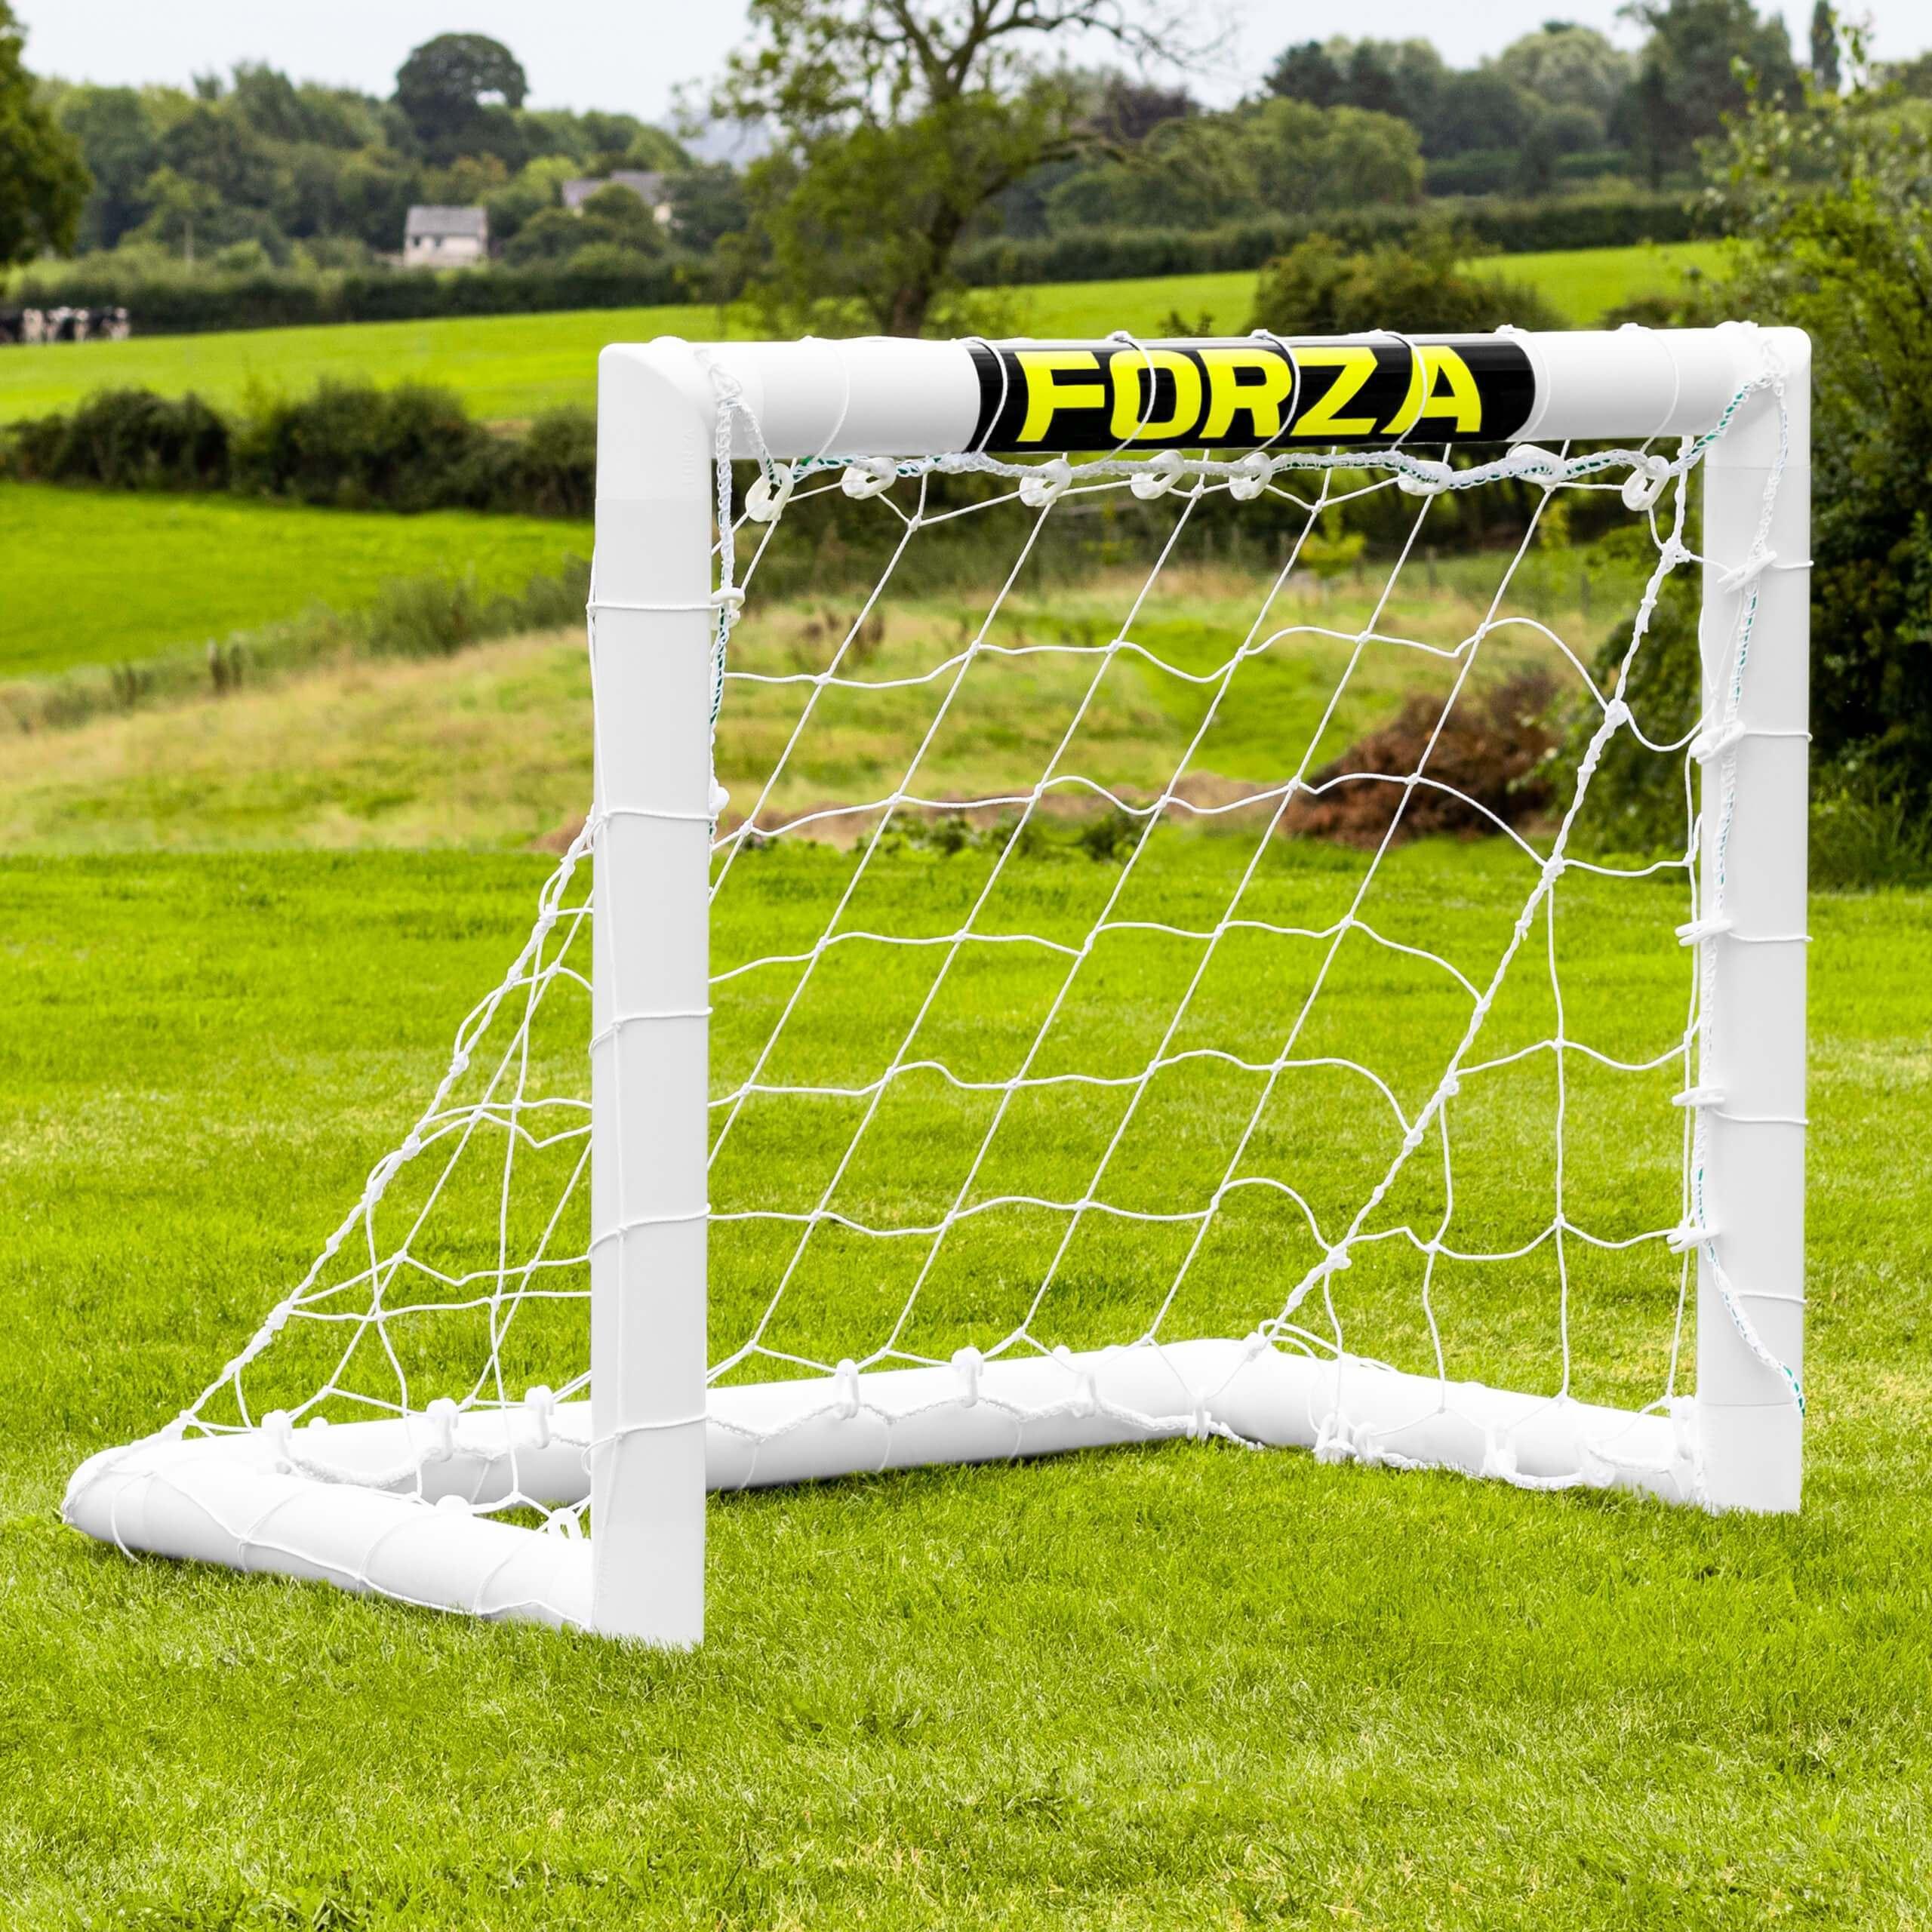 Forza Mini Target Football Goal For Kids